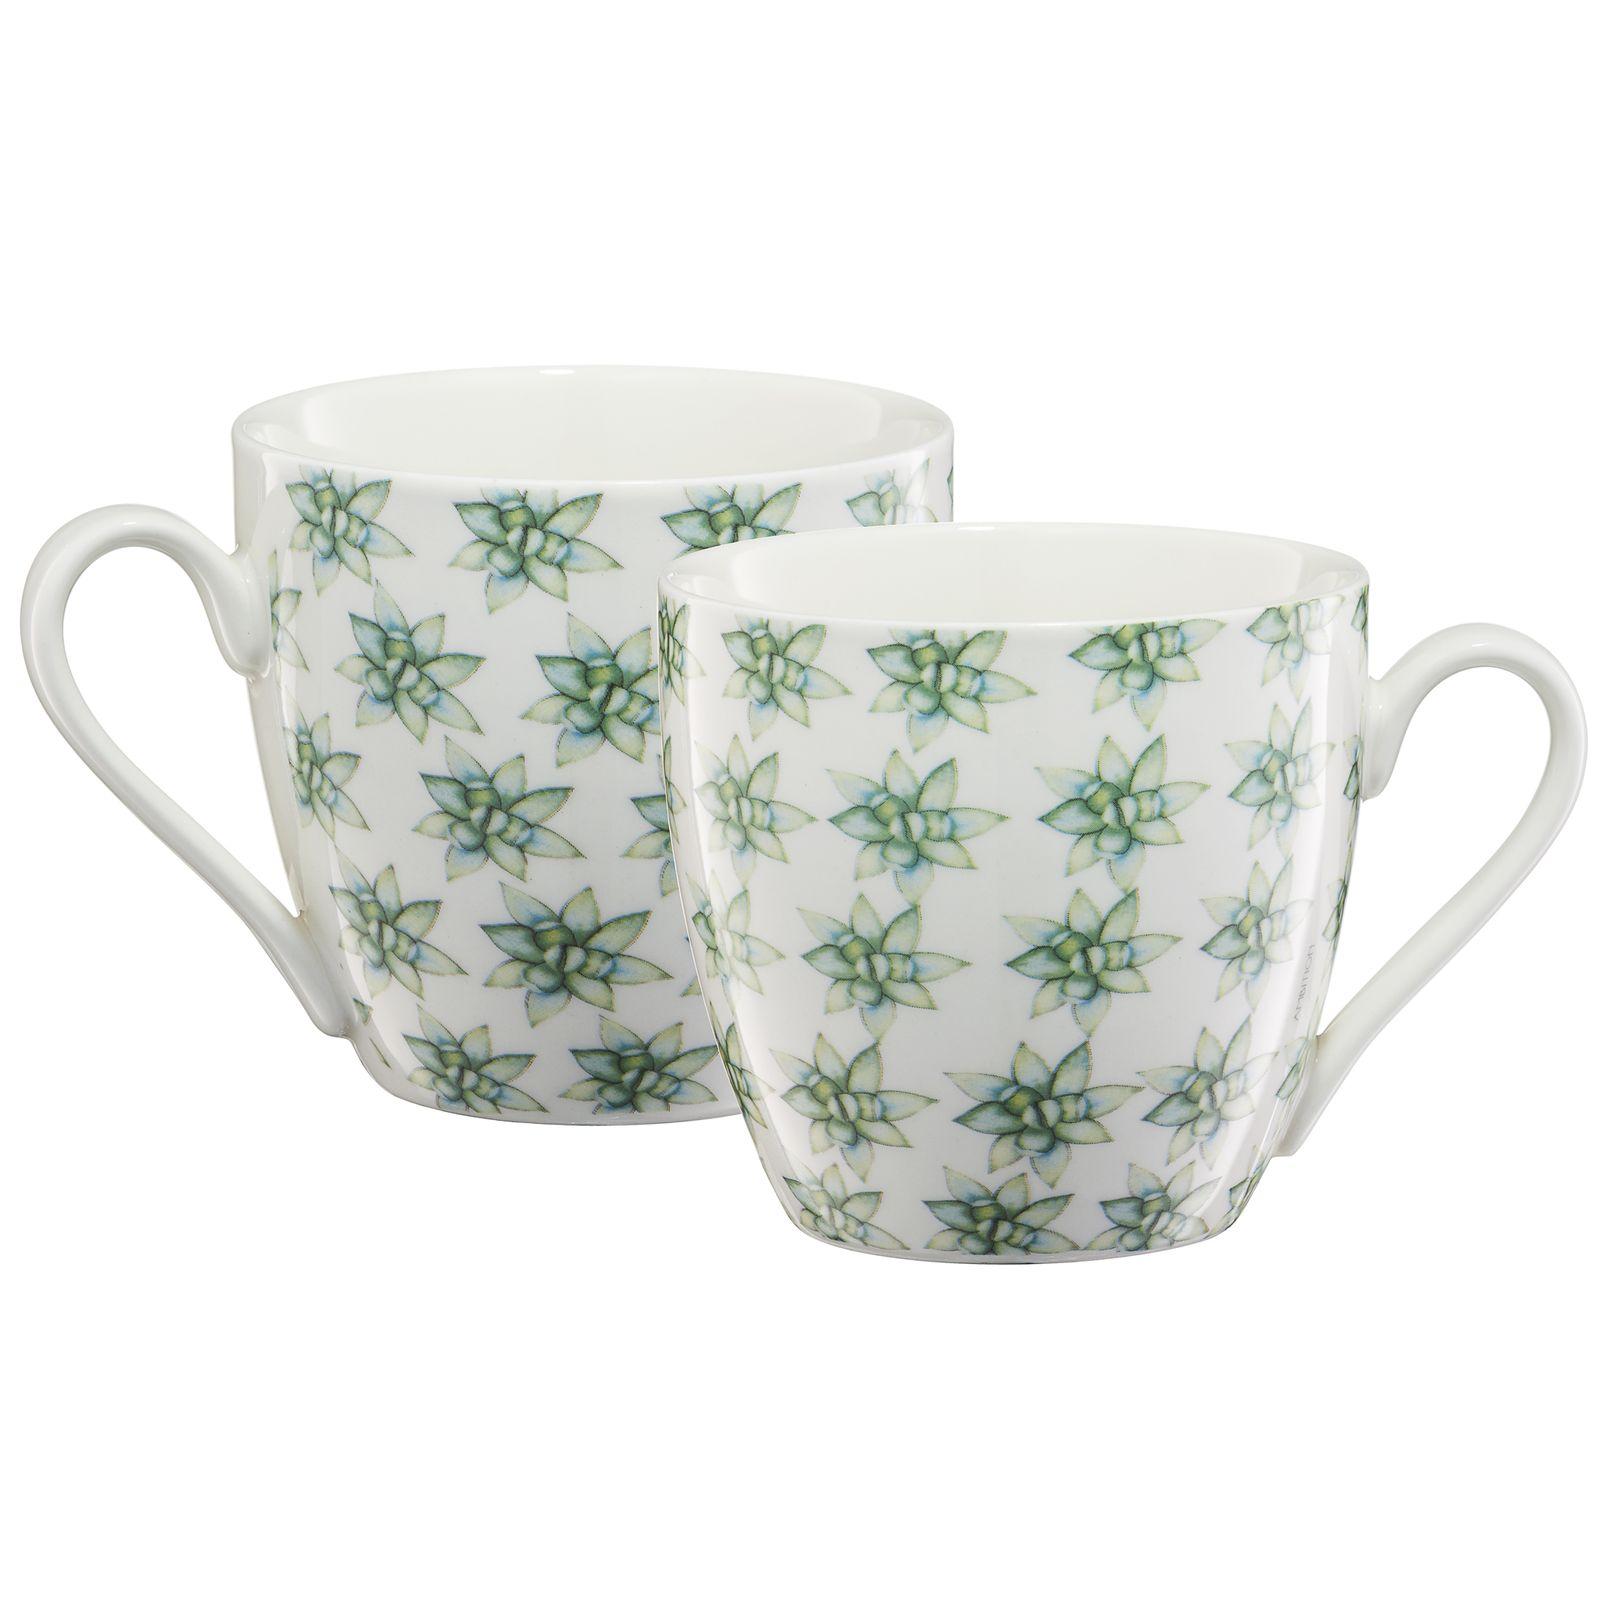 Kubek porcelanowy Cactus pattern 510 ml AMBITION